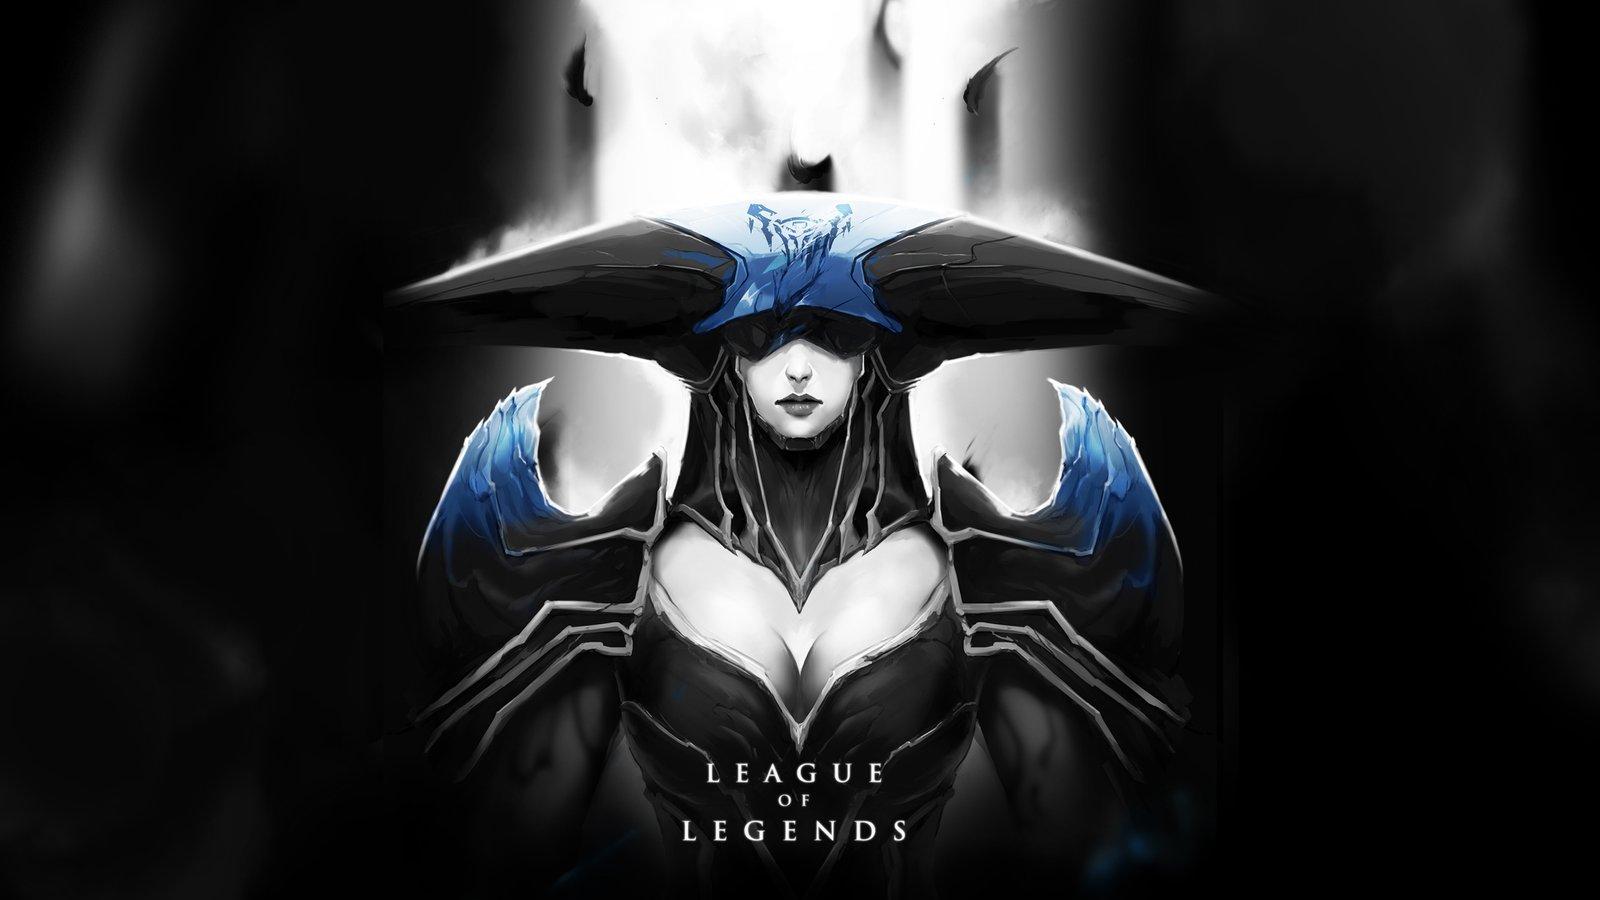 Lissandra League Of Legends Wallpapers HD League Of ...